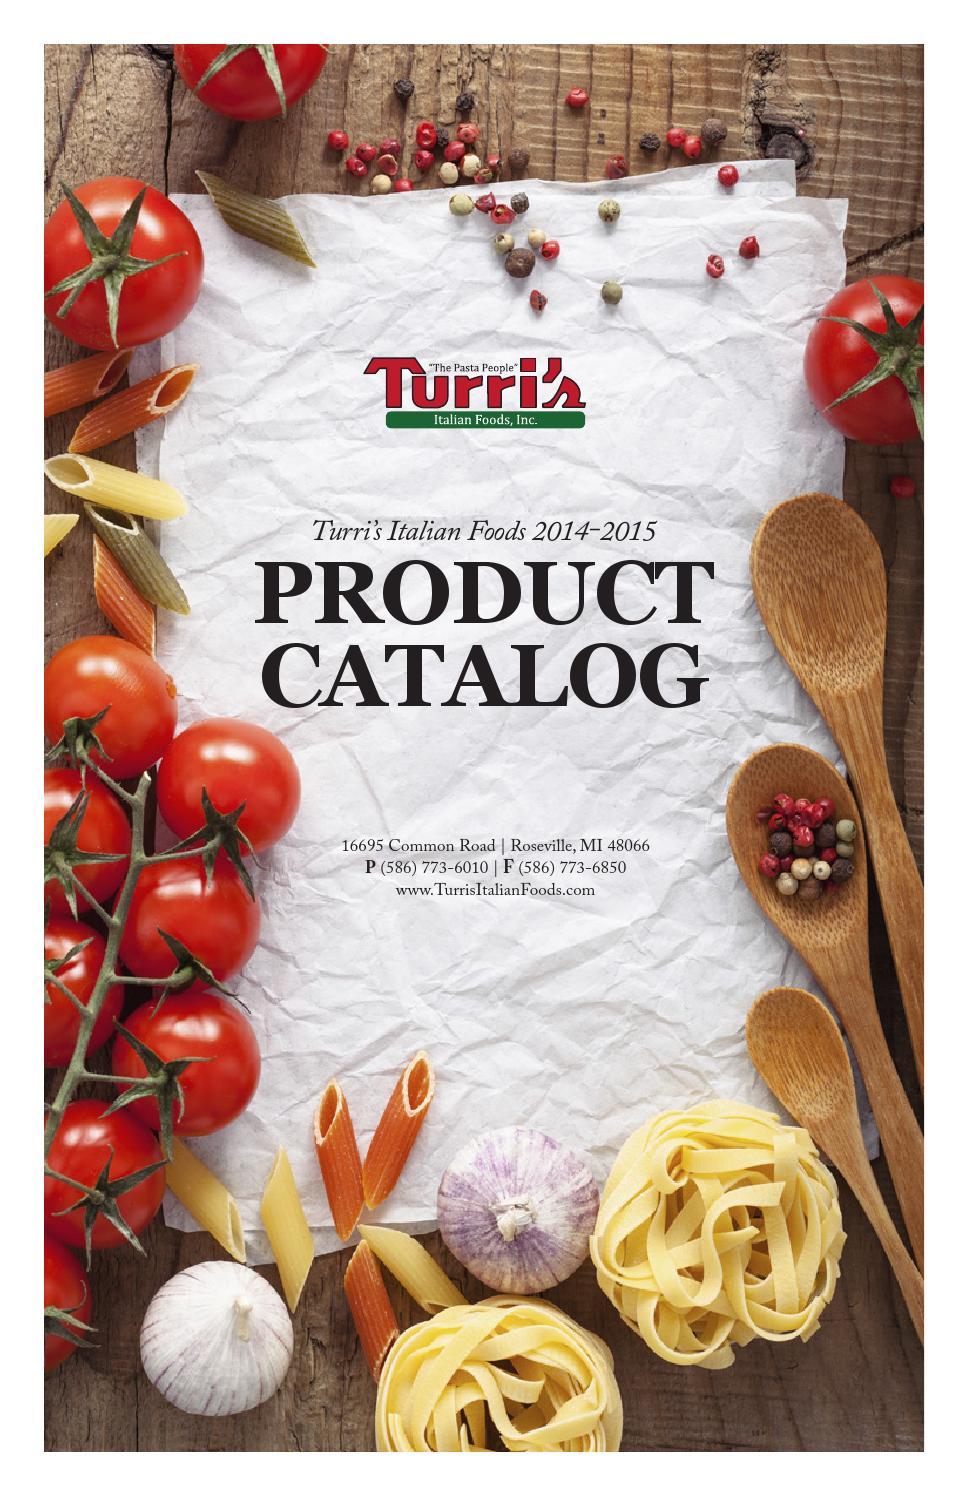 Turri\'s Product Catalog 2014-2015 by Turri\'s Italian Foods - issuu